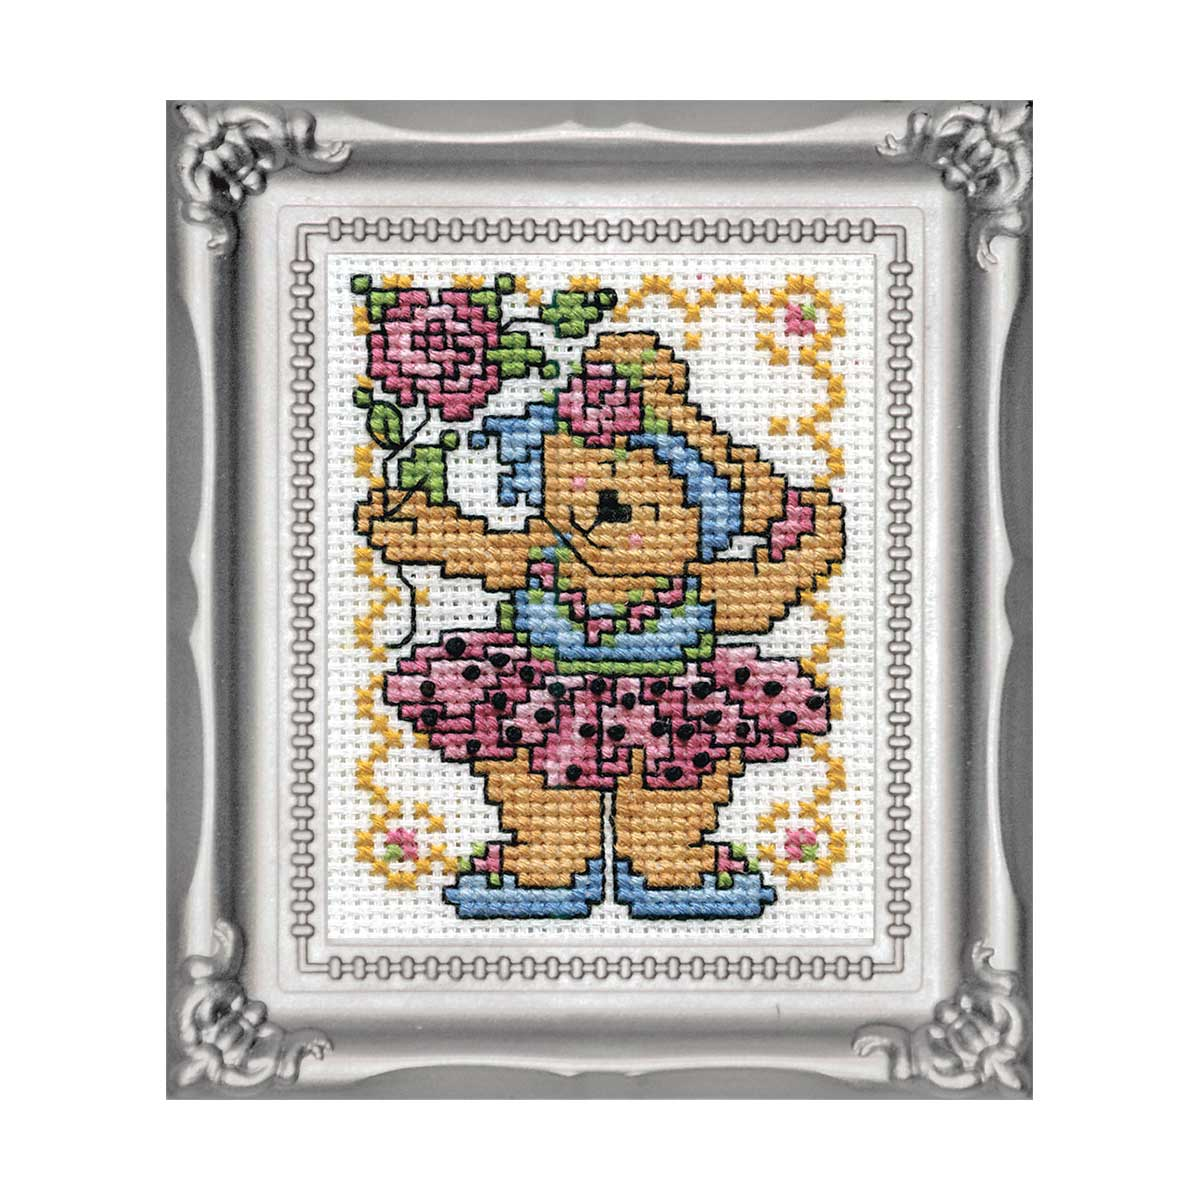 602 DWC Набор для вышивания 'Мишка-балерина' 5х8 см